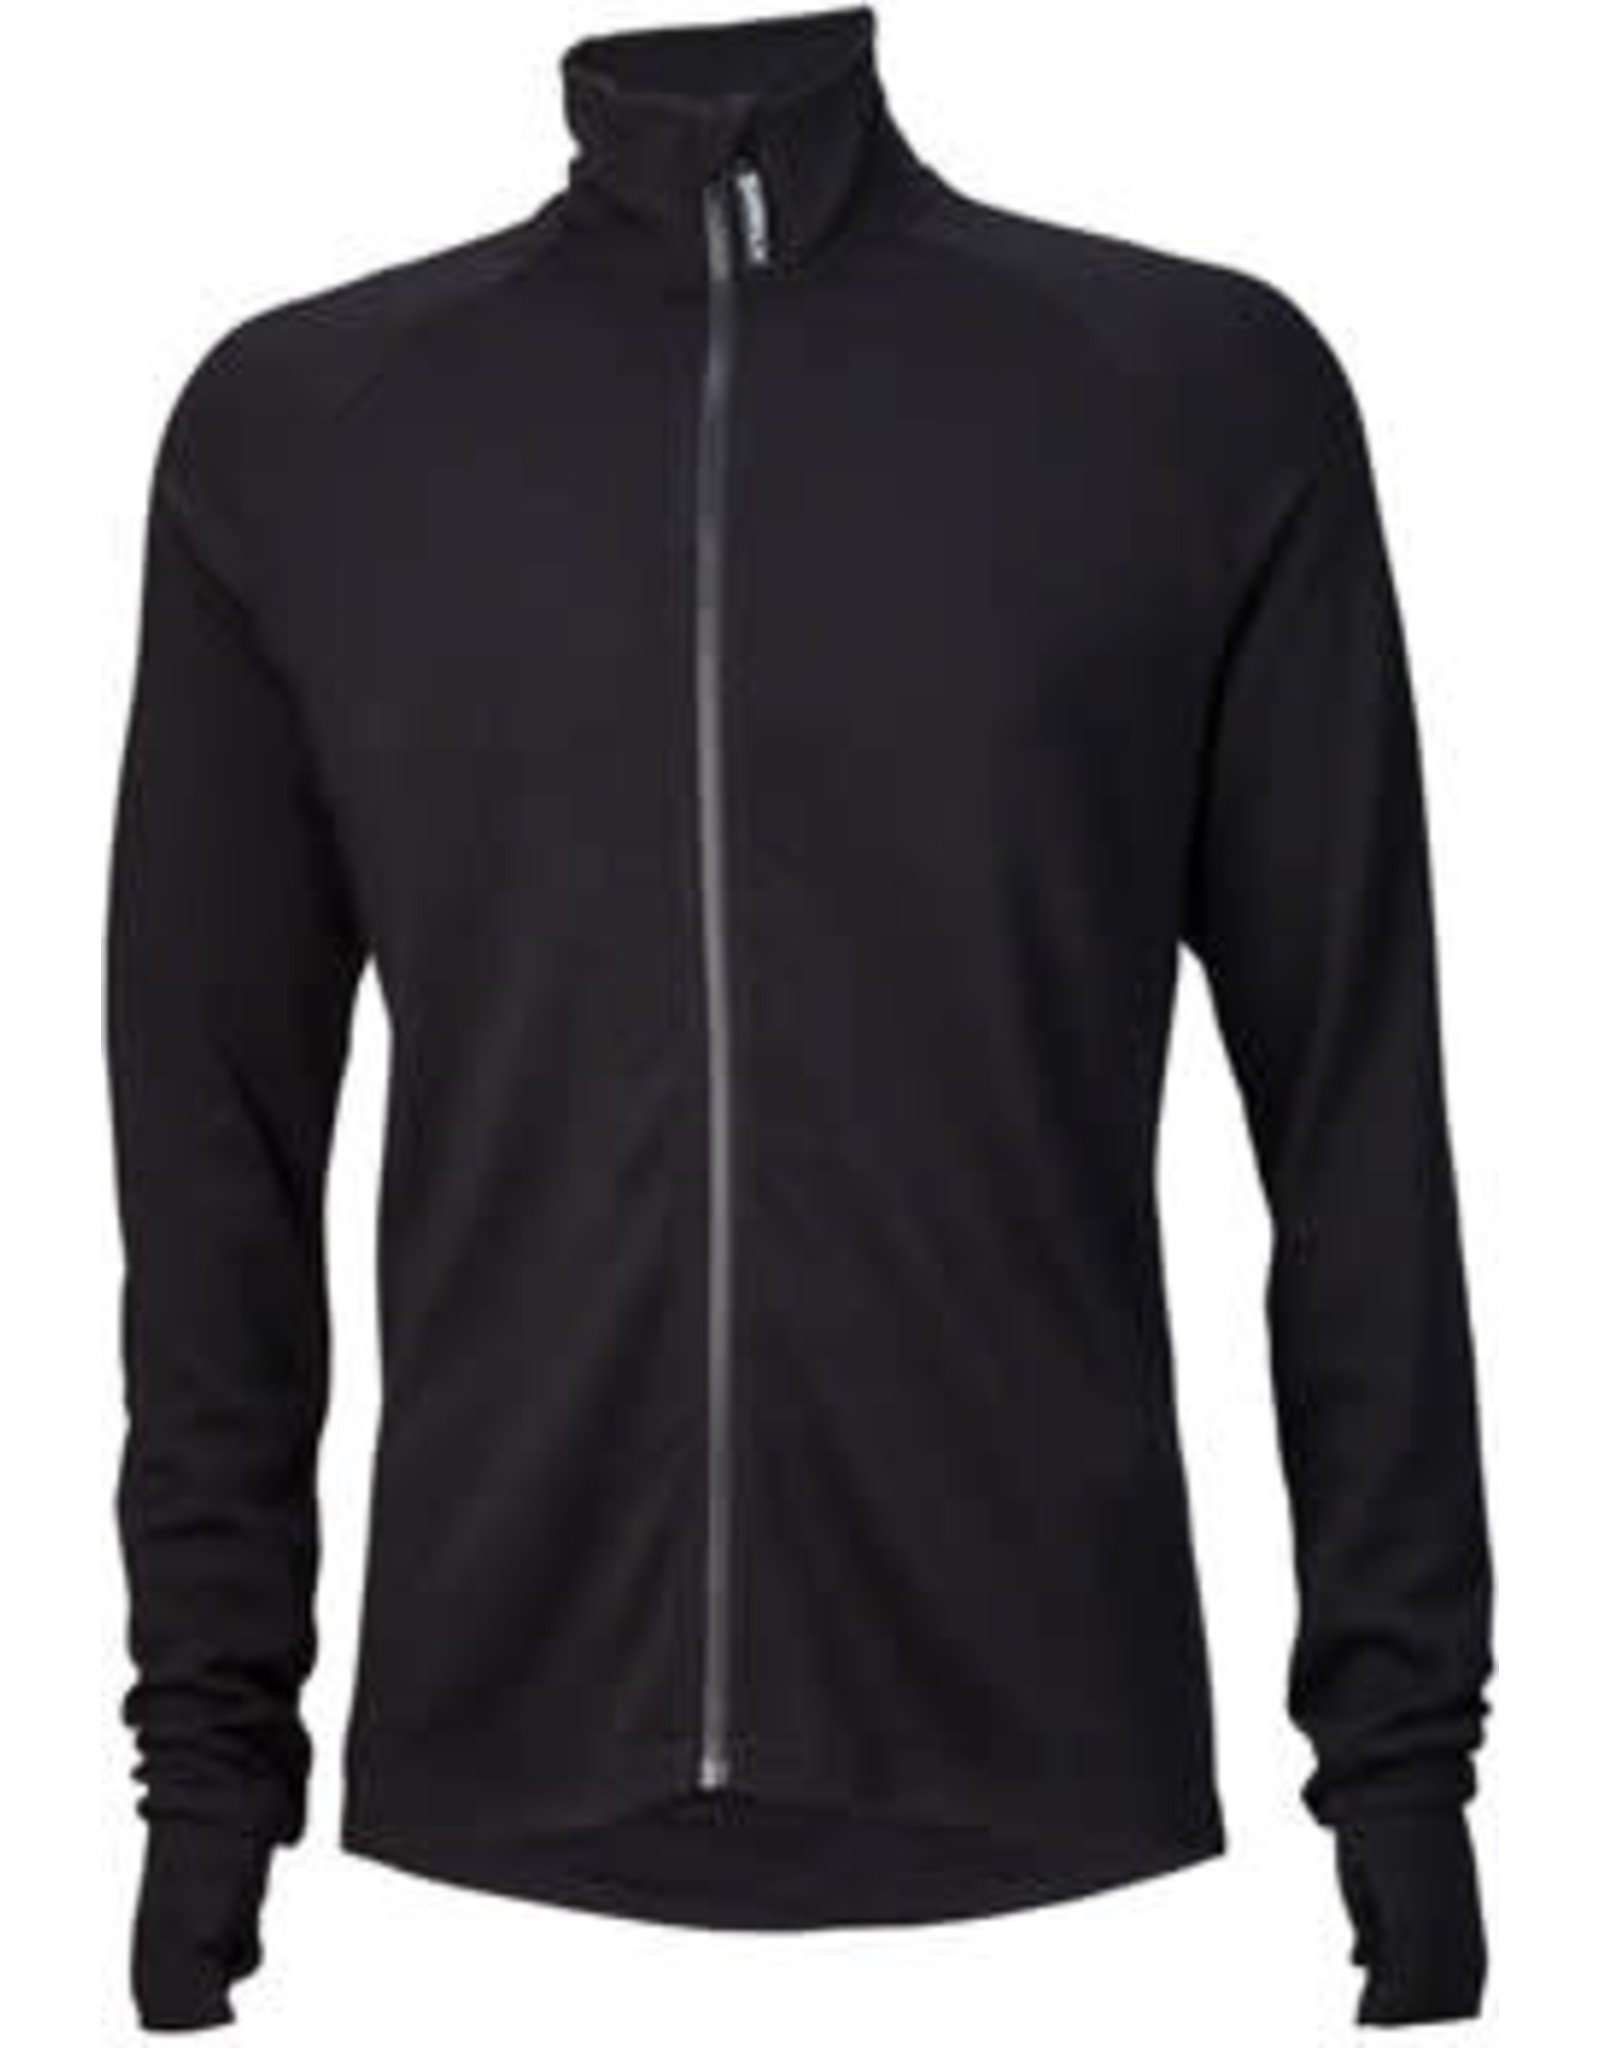 Surly Surly Merino Wool Jersey - Black, Long Sleeve, Men's, Medium